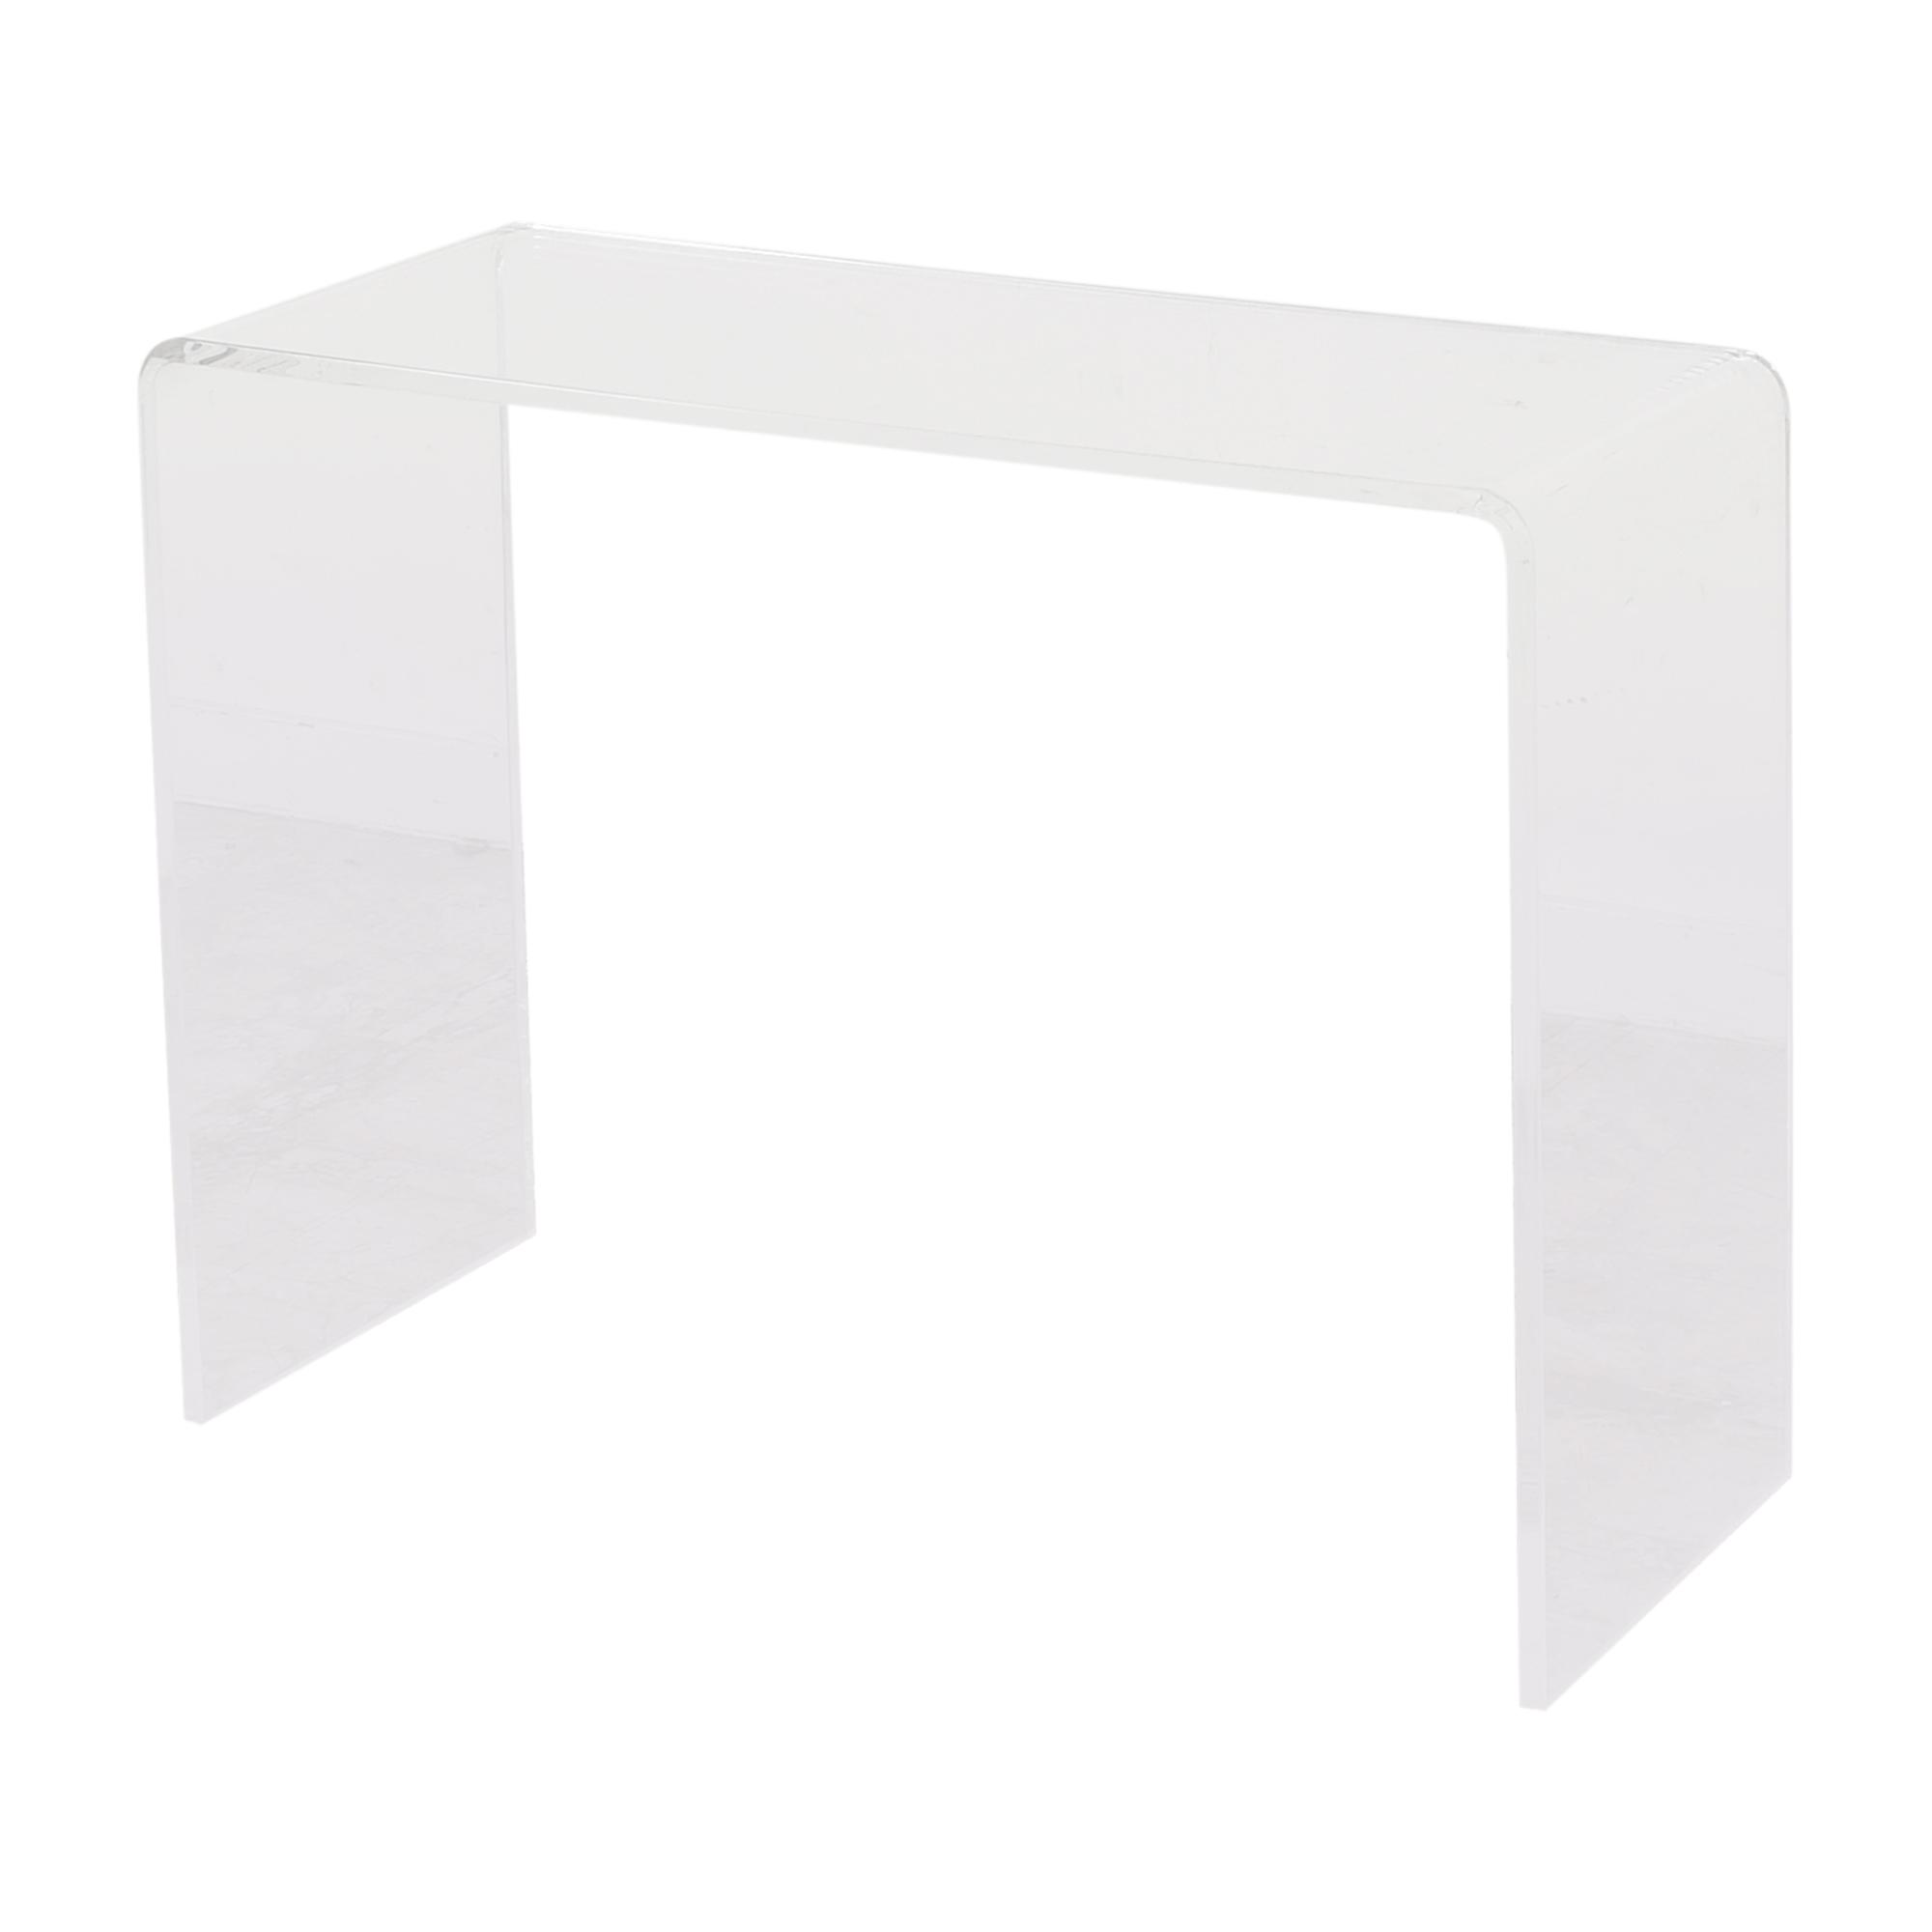 CB2 CB2 Peekaboo Acrylic Console Table ct